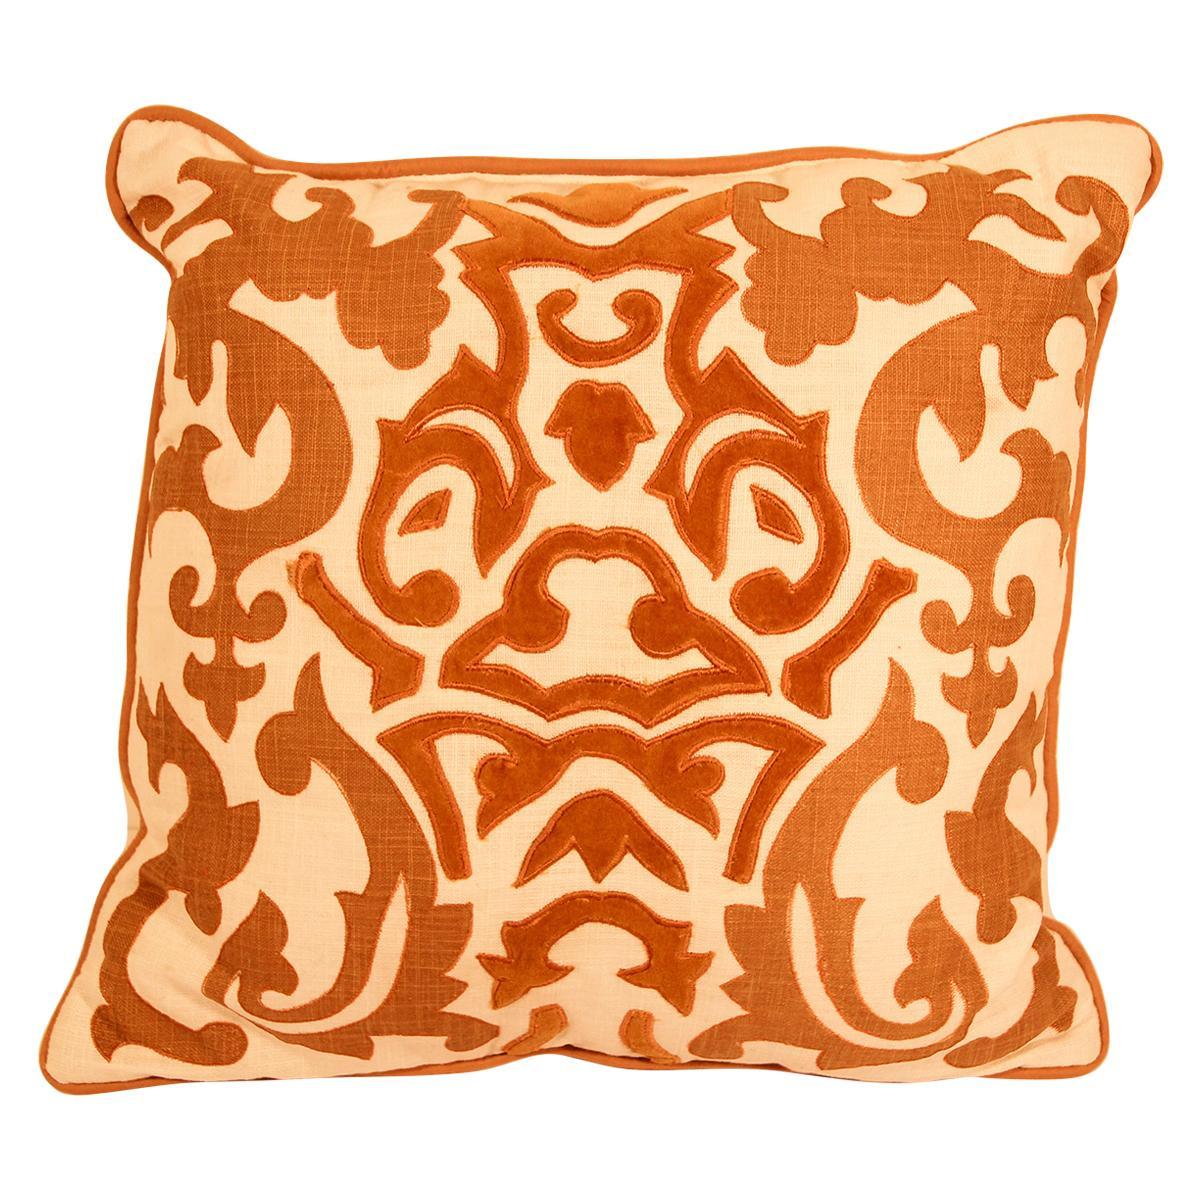 Decorative Silk Velvet Applique Throw Pillow